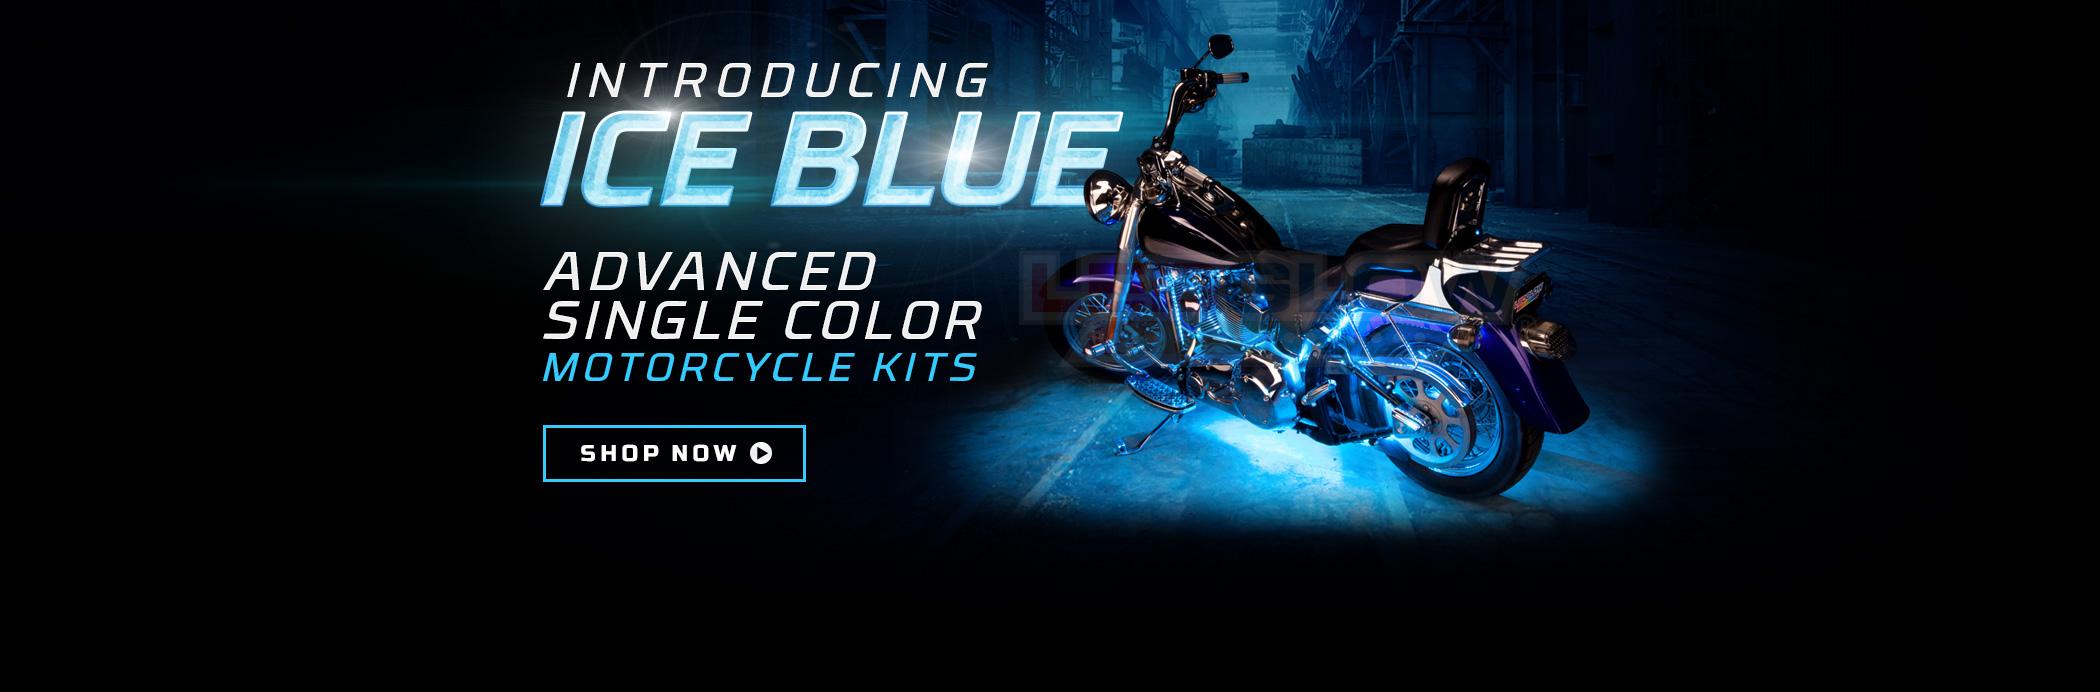 Advanced Ice Blue Motorcycle LED Lights